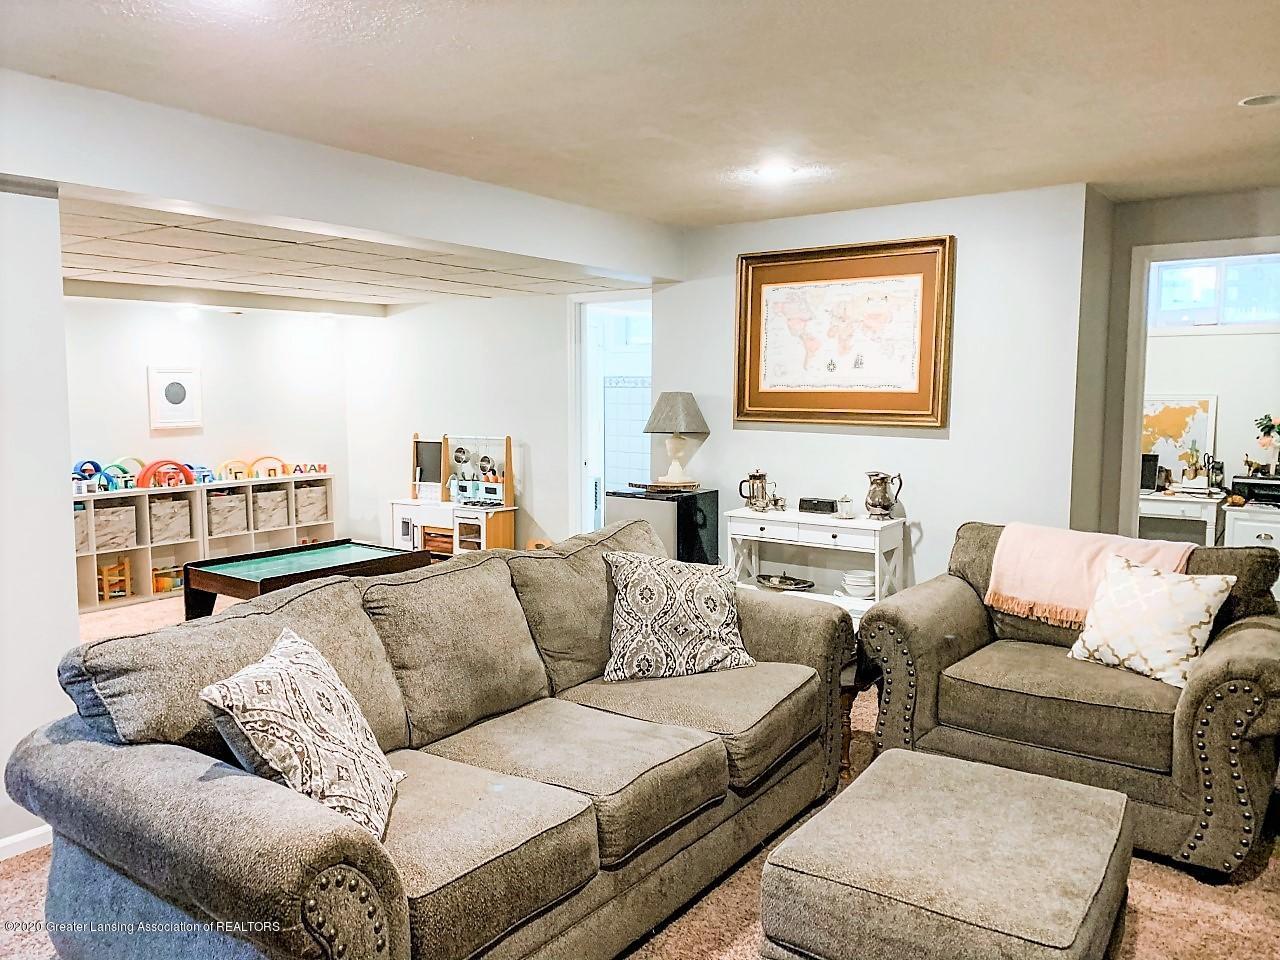 6820 Delta River Dr - Basement w/furniture - 28